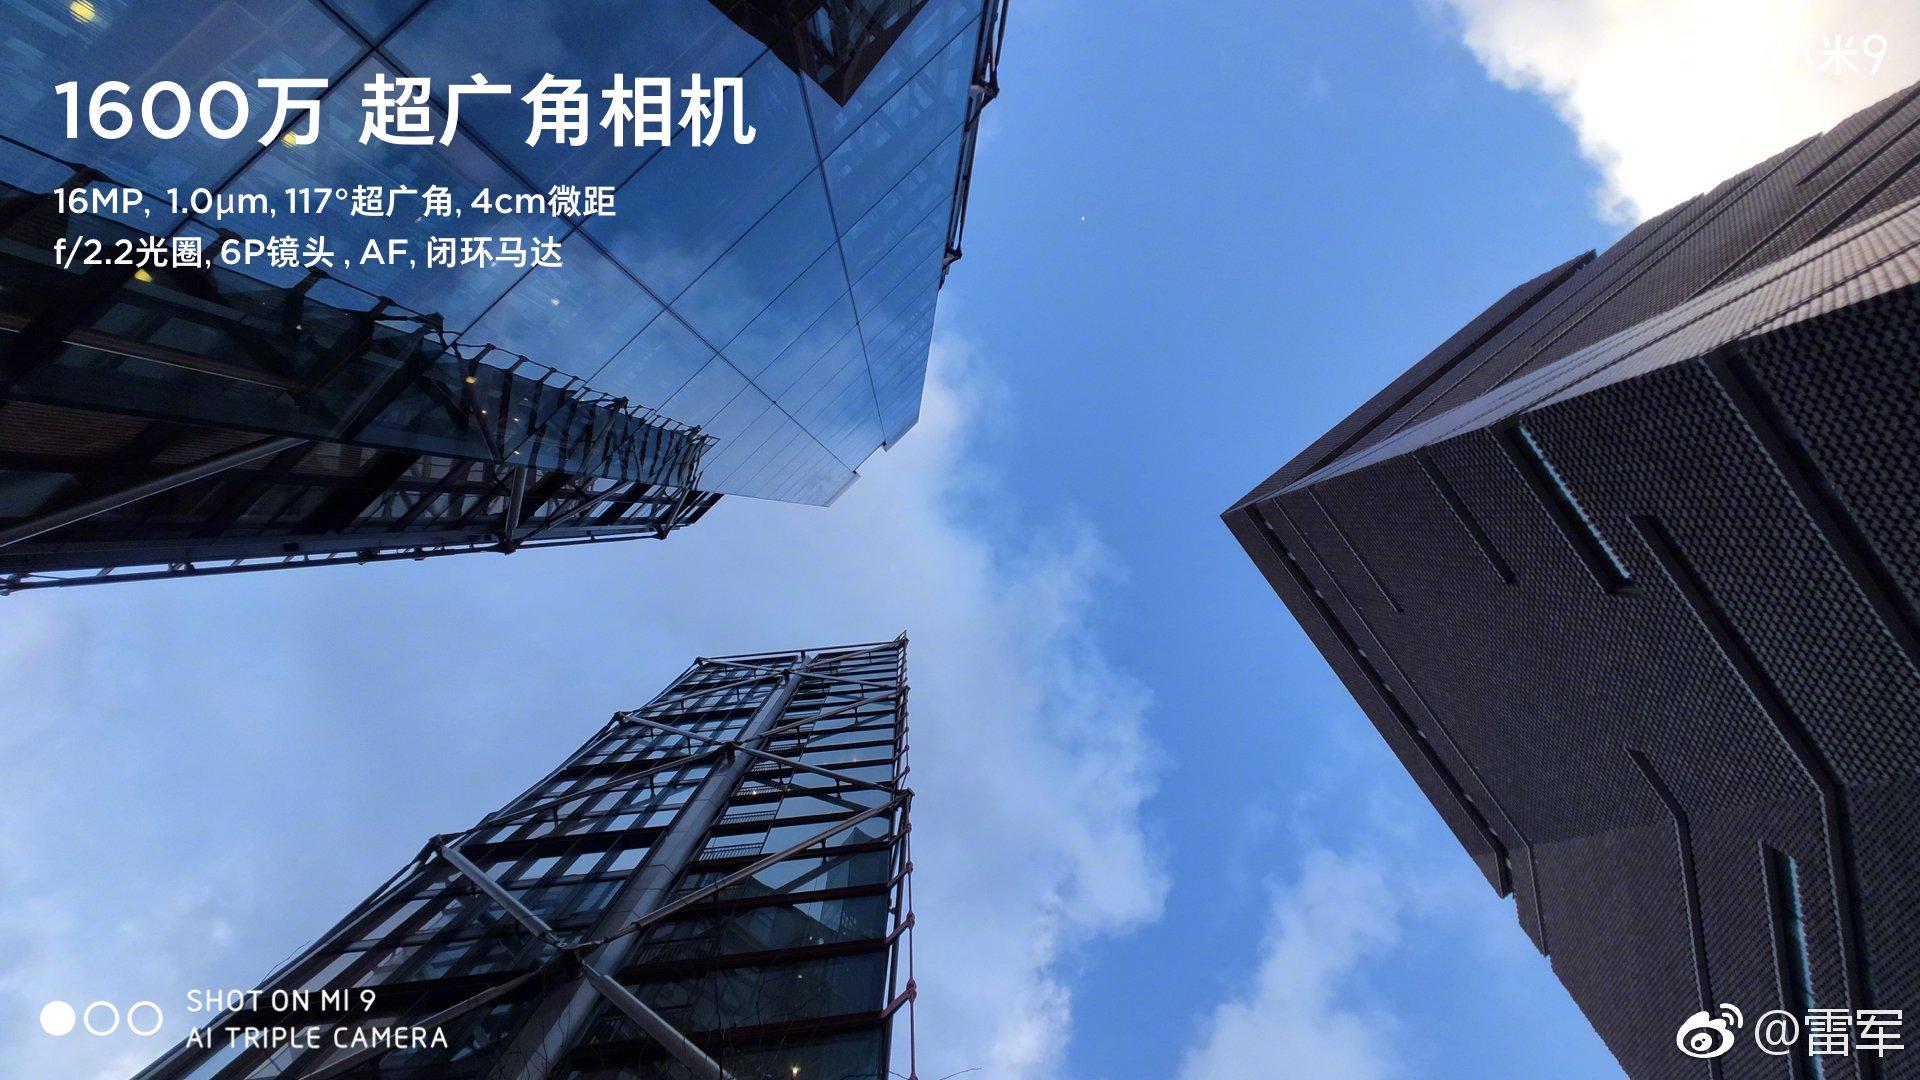 Xiaomi Mi 9 Complete Specifications 2